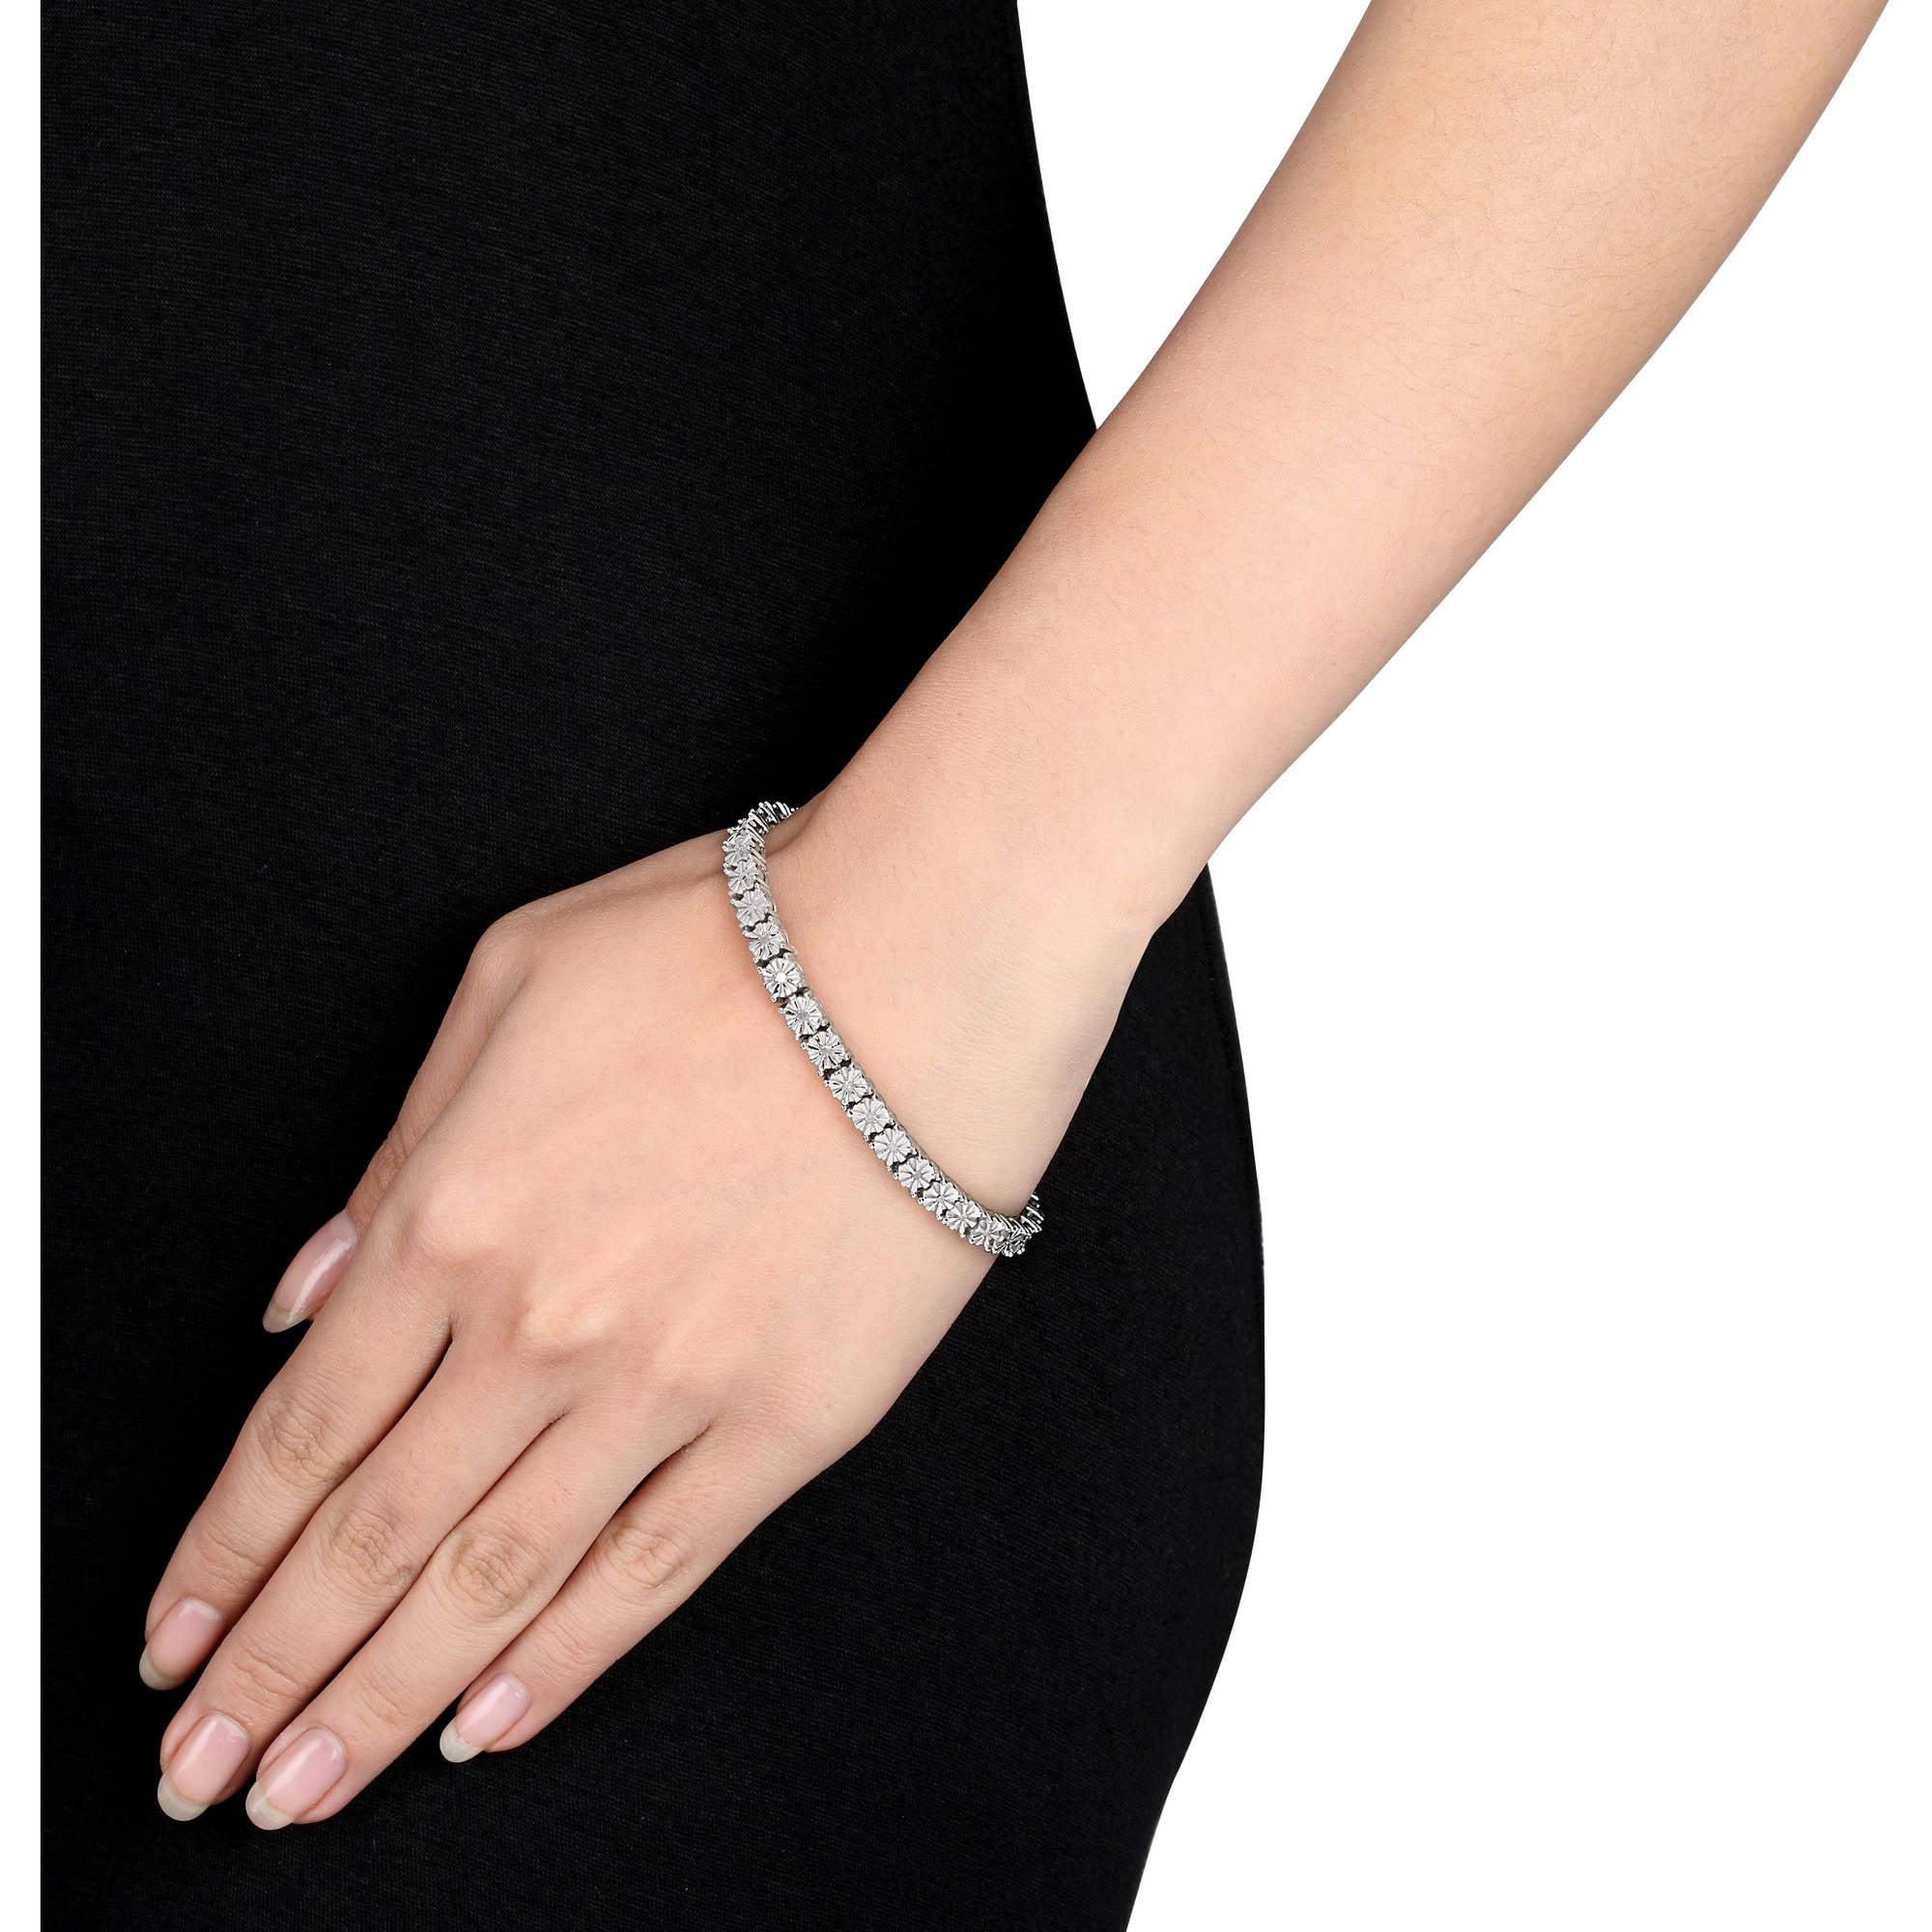 Miabella 1 2 Carat T W Diamond Sterling Silver Tennis Bracelet 7